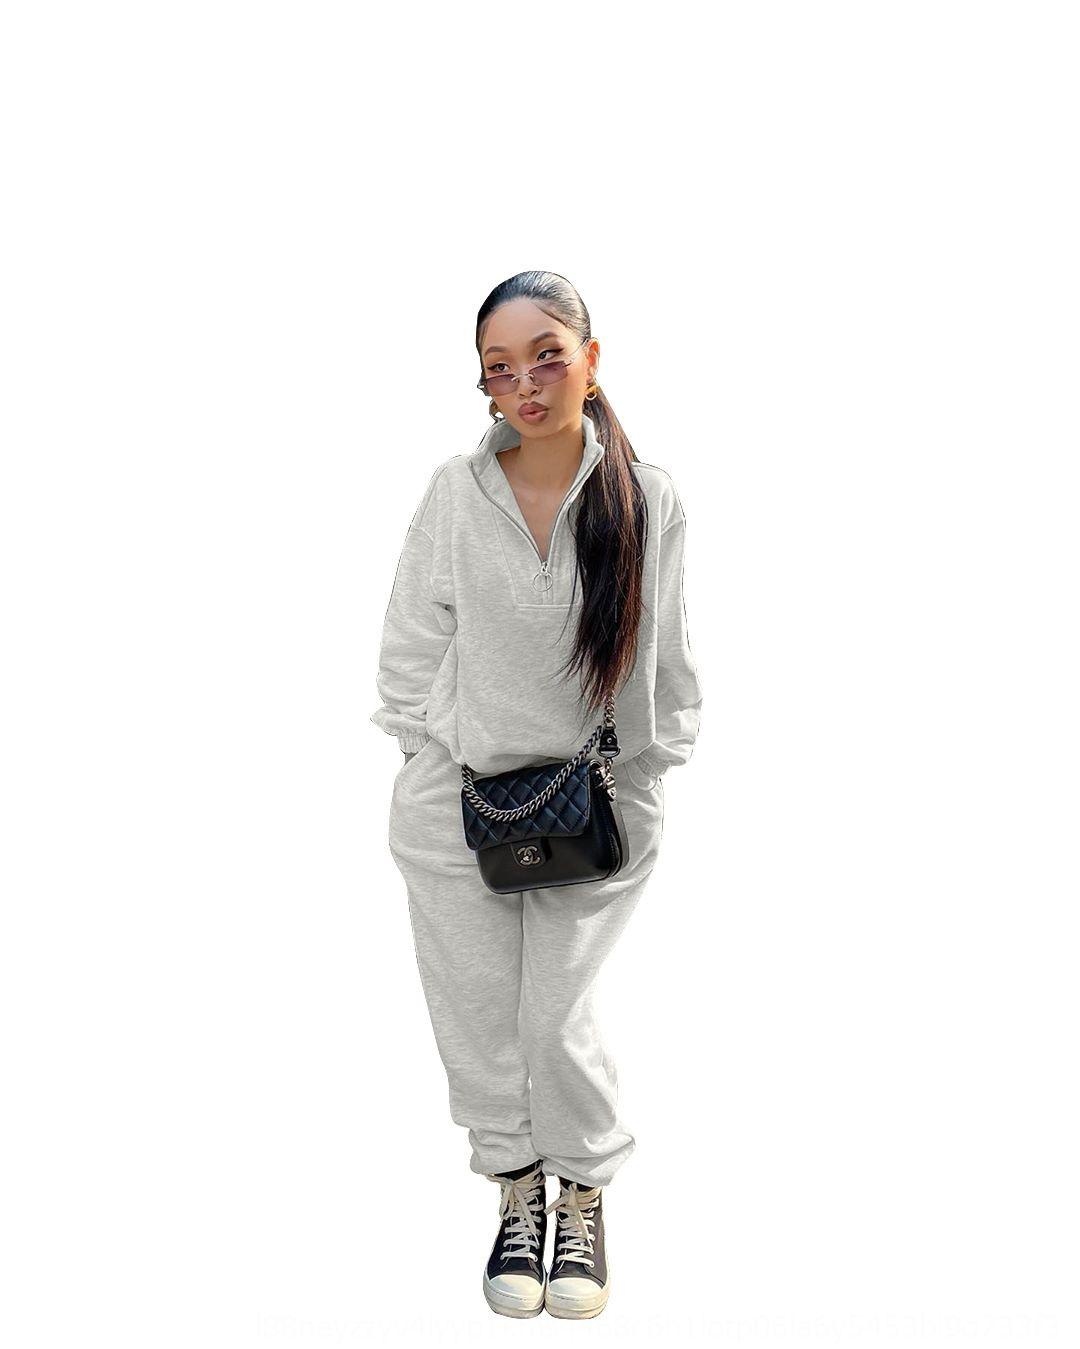 nNpv kliou Women Long Sleeve CropTop Slim Outfit Leggings letter Pieces Set Two Print High elastic Skinny Tracksuit Female Sportswear Y20011